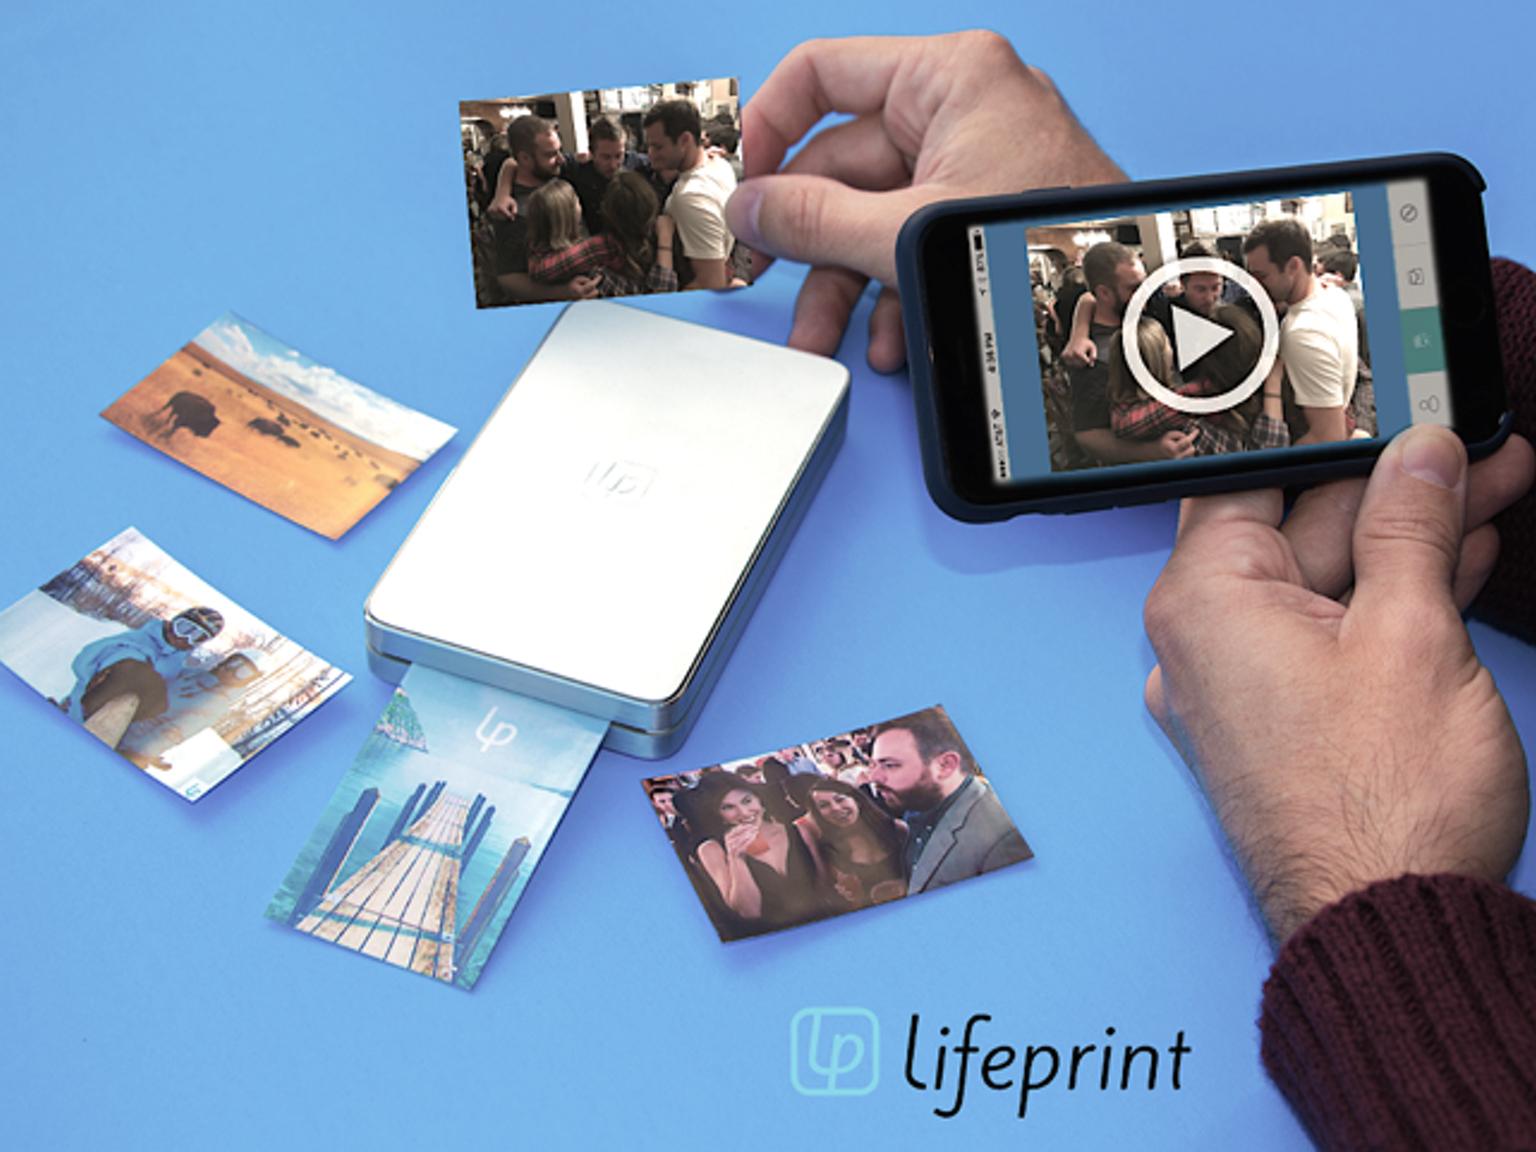 print live photos